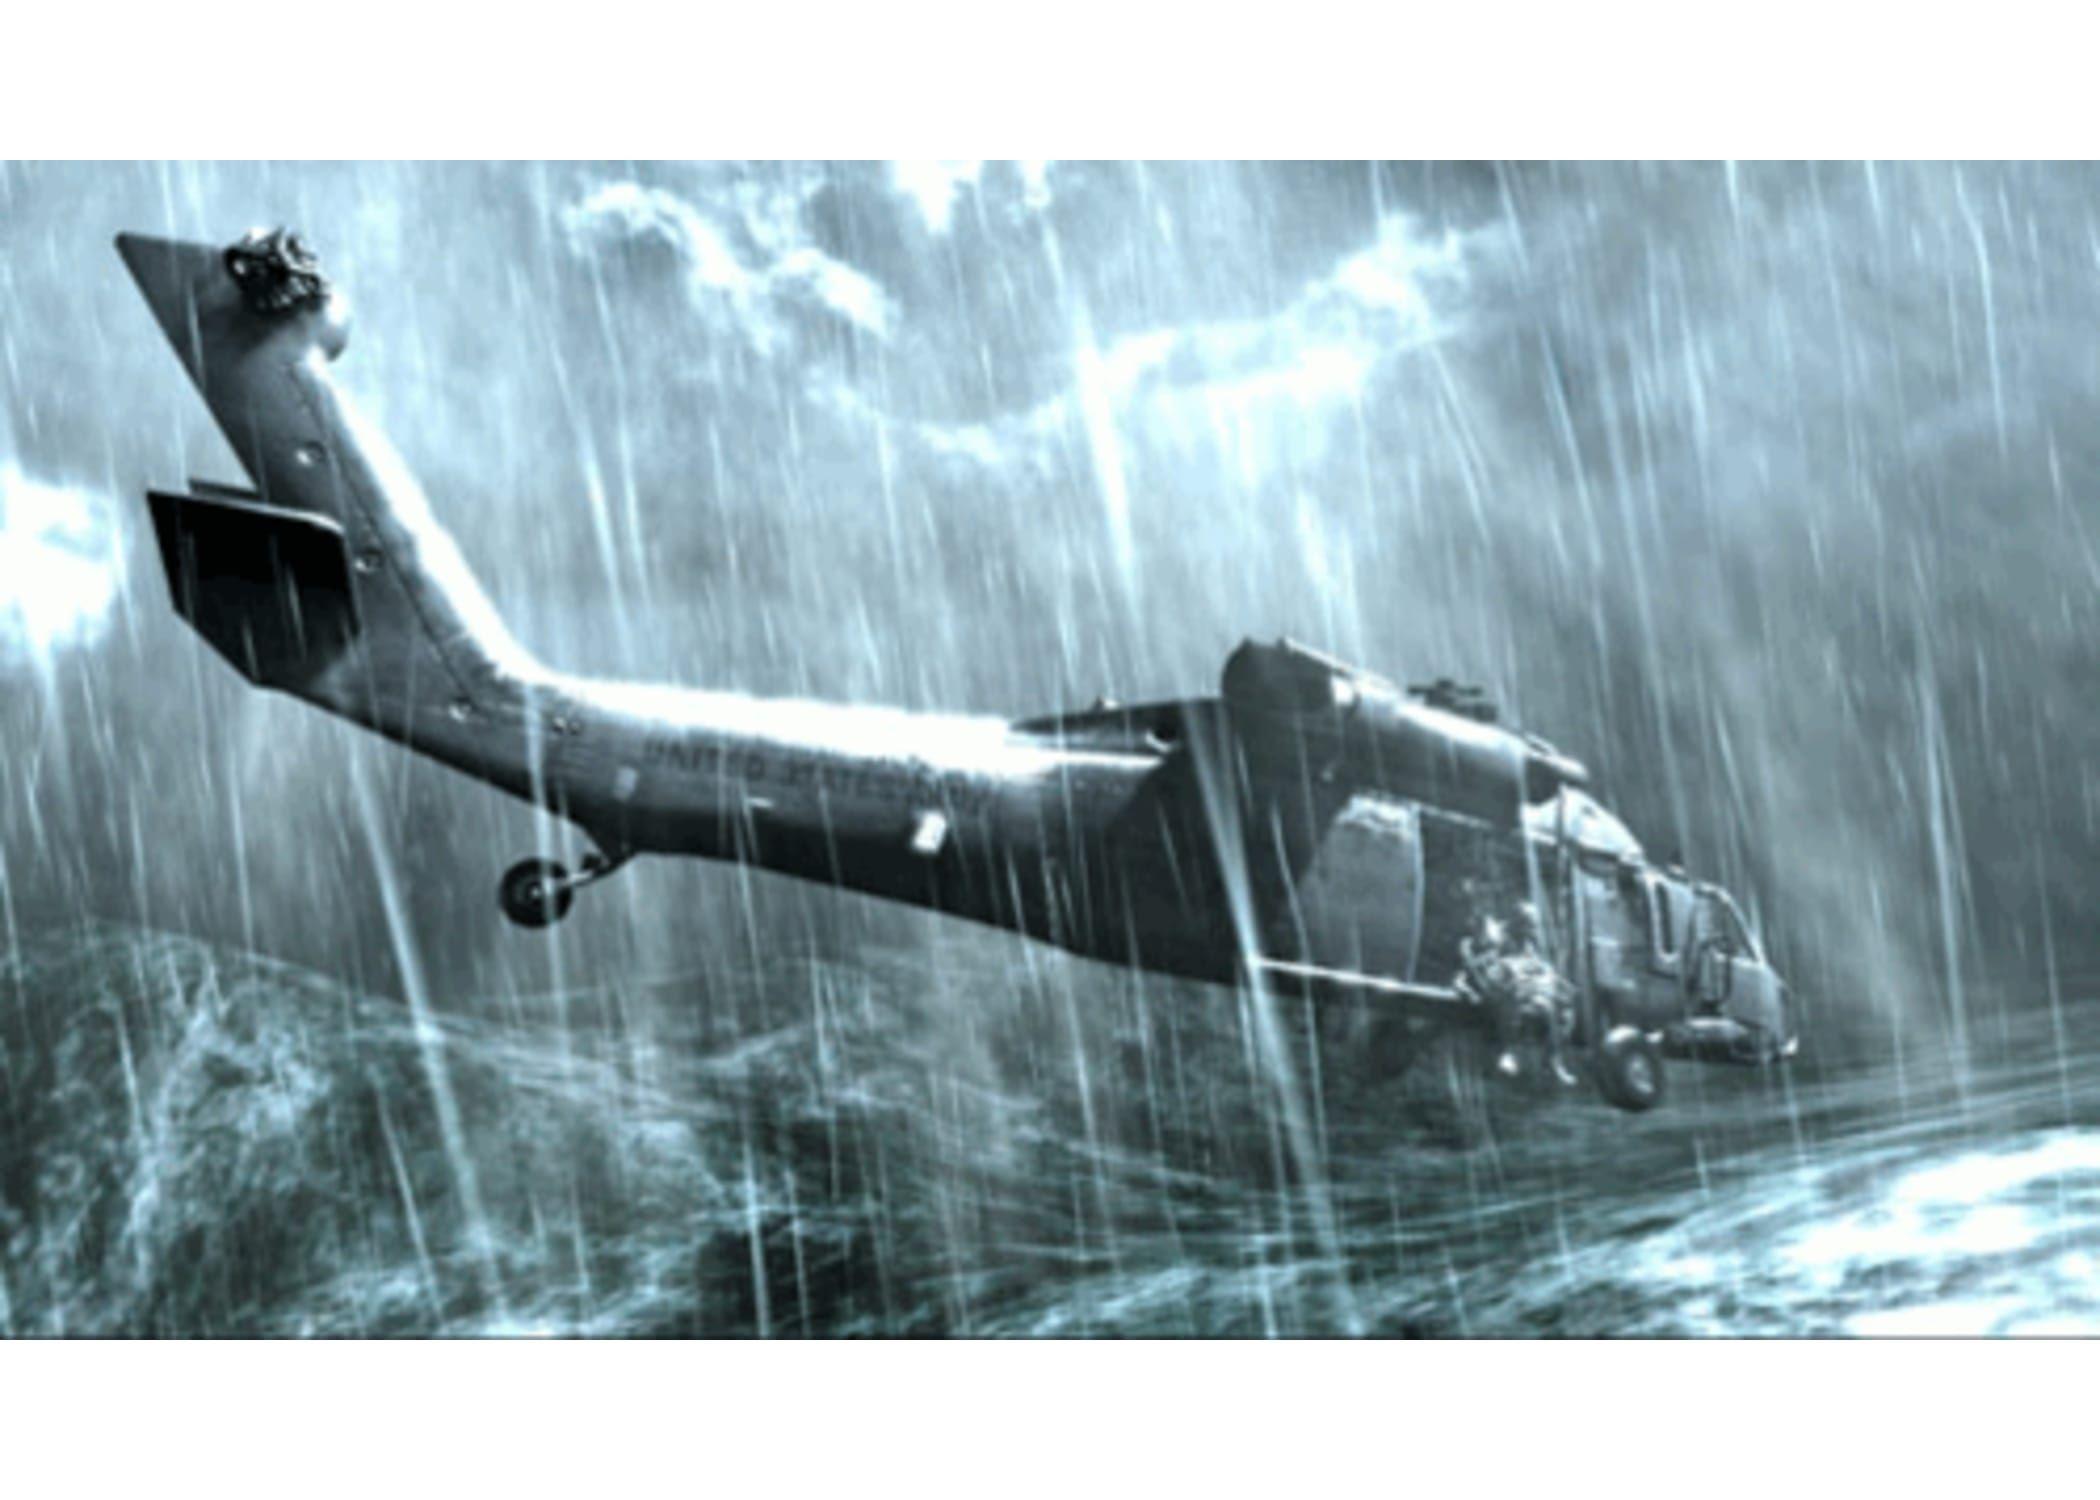 Buy Call of Duty 4 Modern Warfare Collectors Edition on